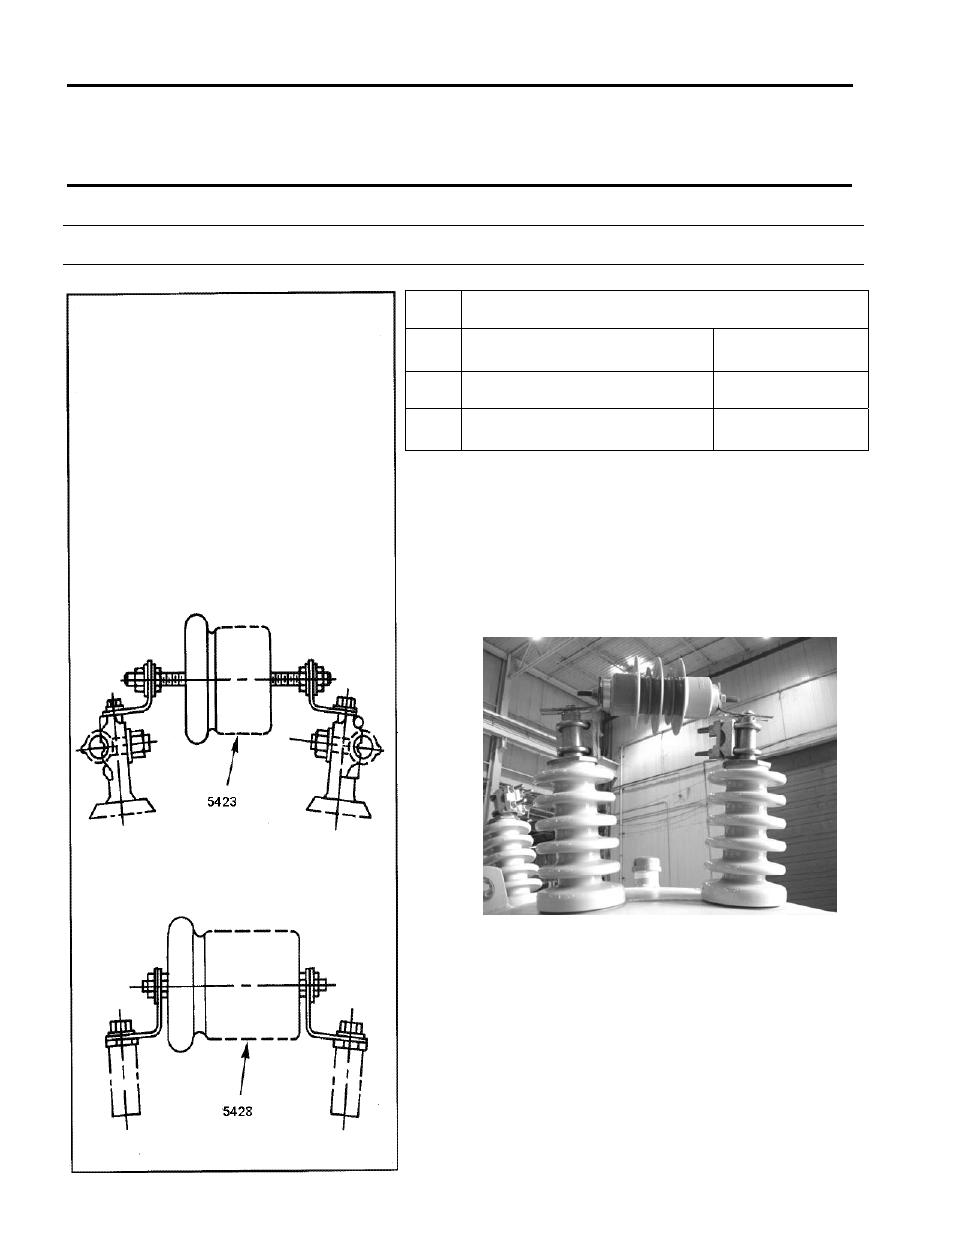 hight resolution of parts list bypass arresters siemens jfr distribution step voltage regulator 21 115532 001 user manual page 25 28